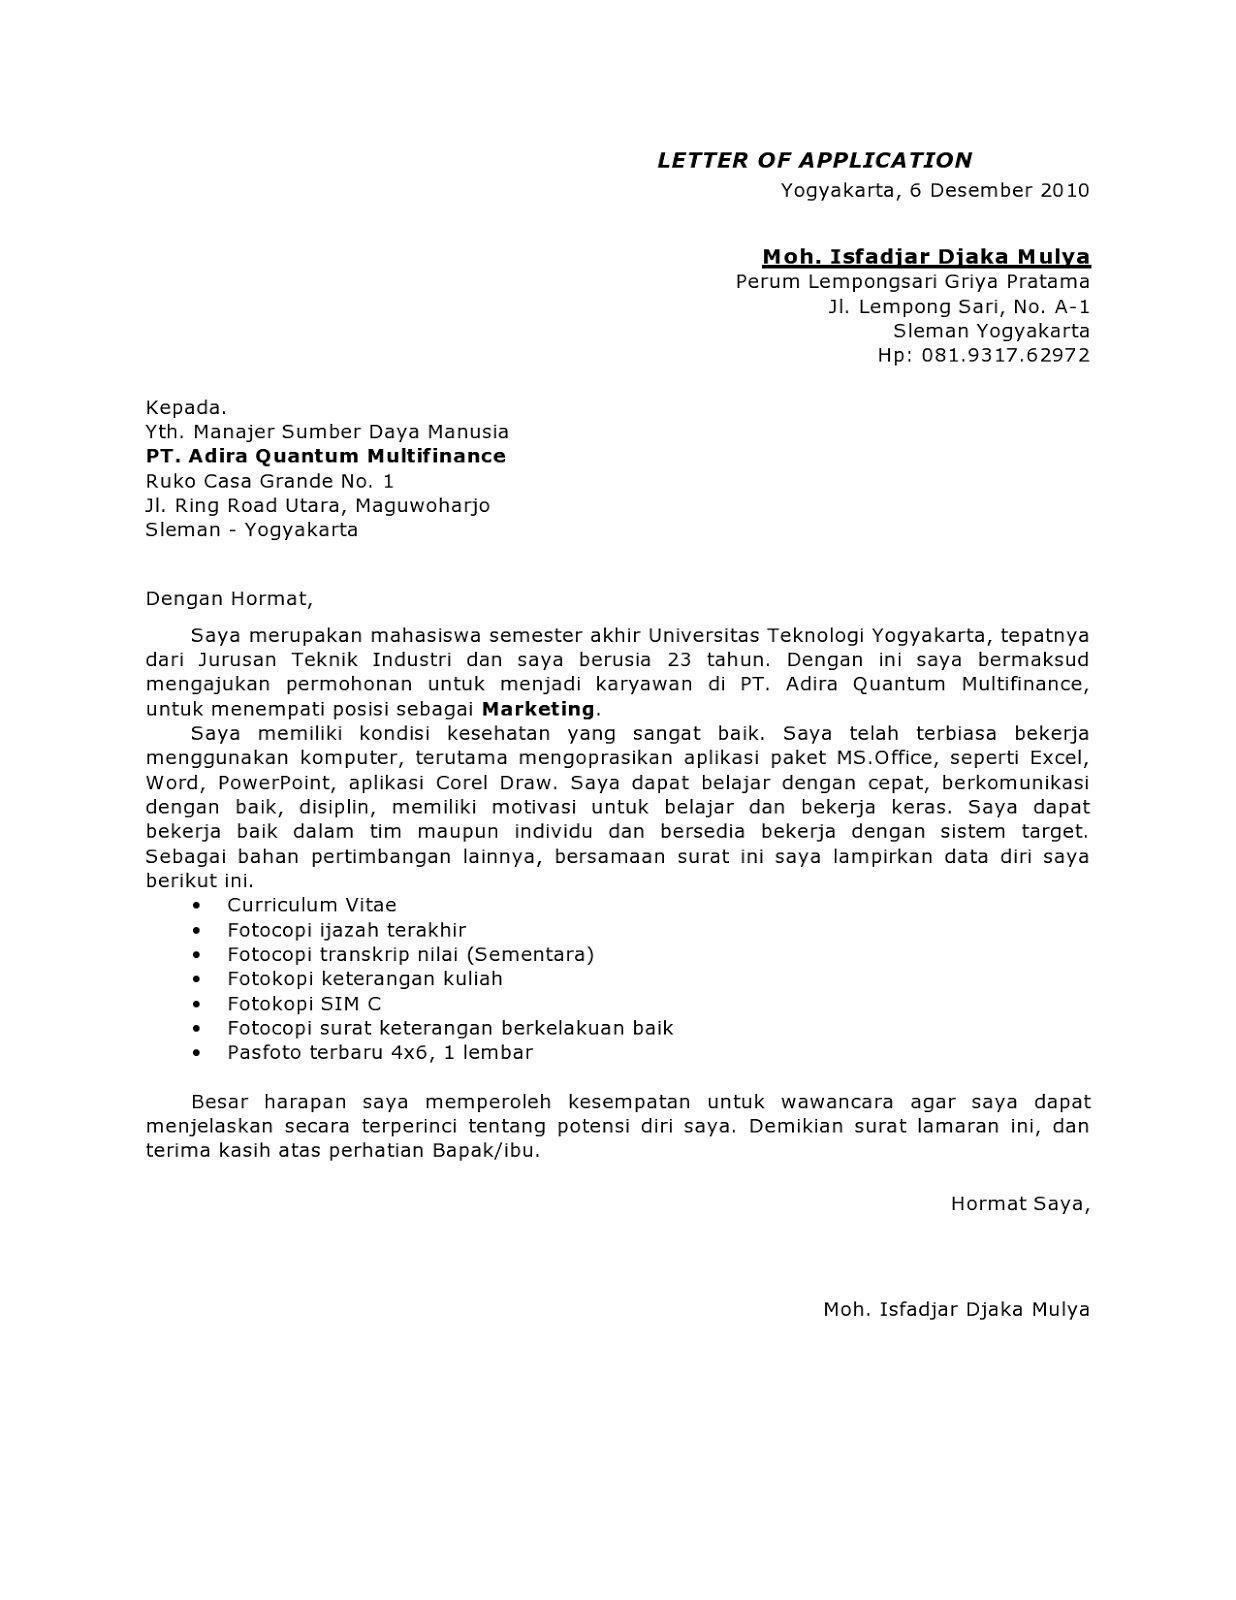 Contoh Surat Lamaran Kerja Adira Quantum Ben Jobs Cover